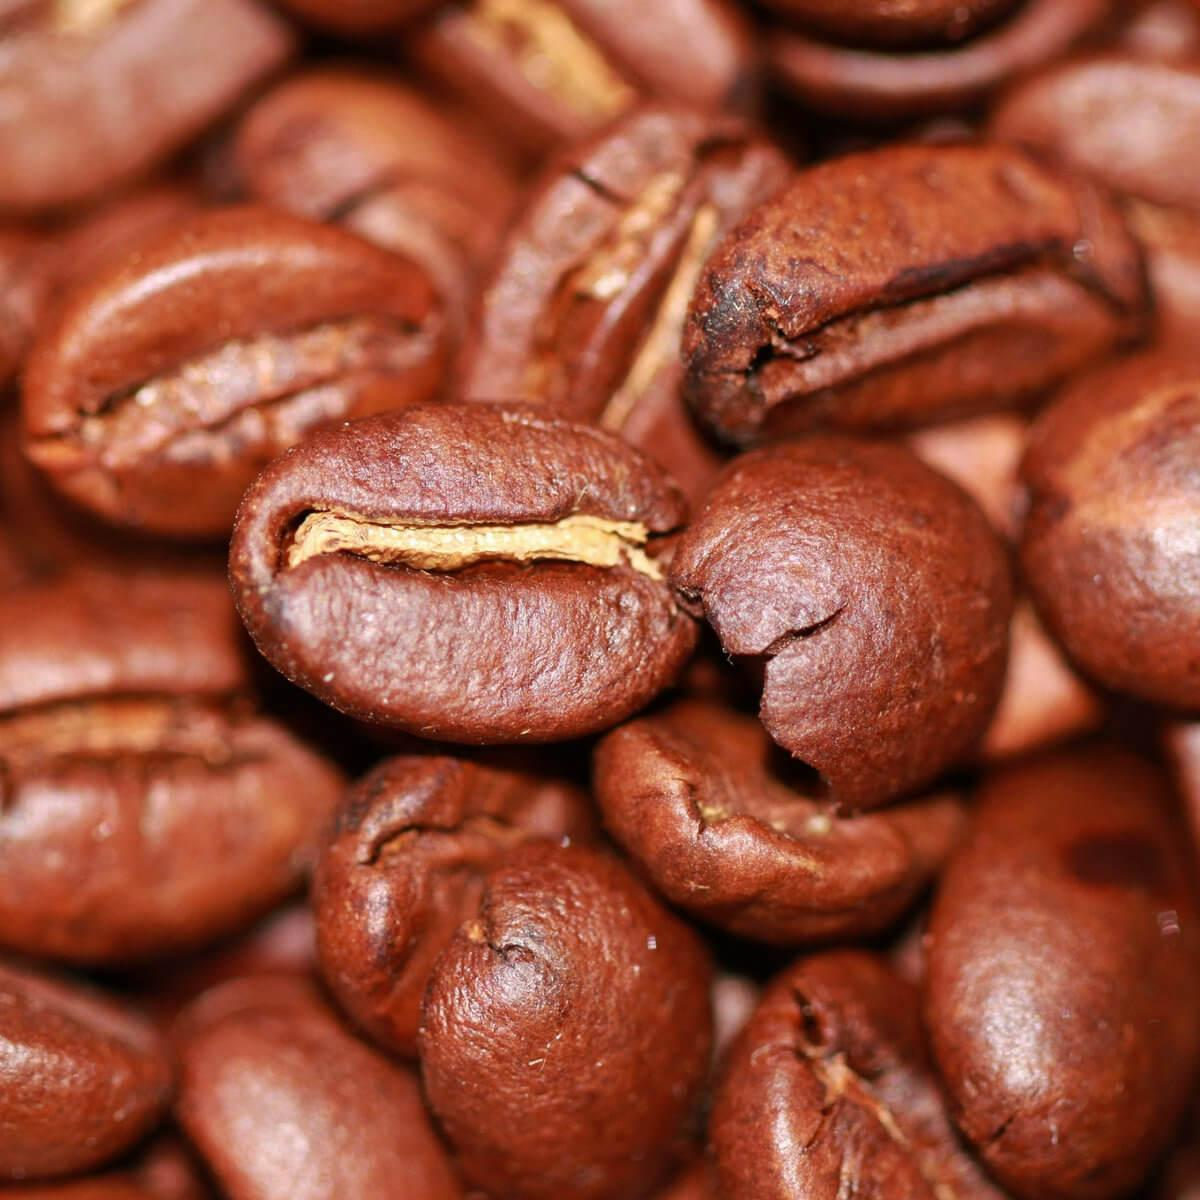 Coffee Beans For Enemas